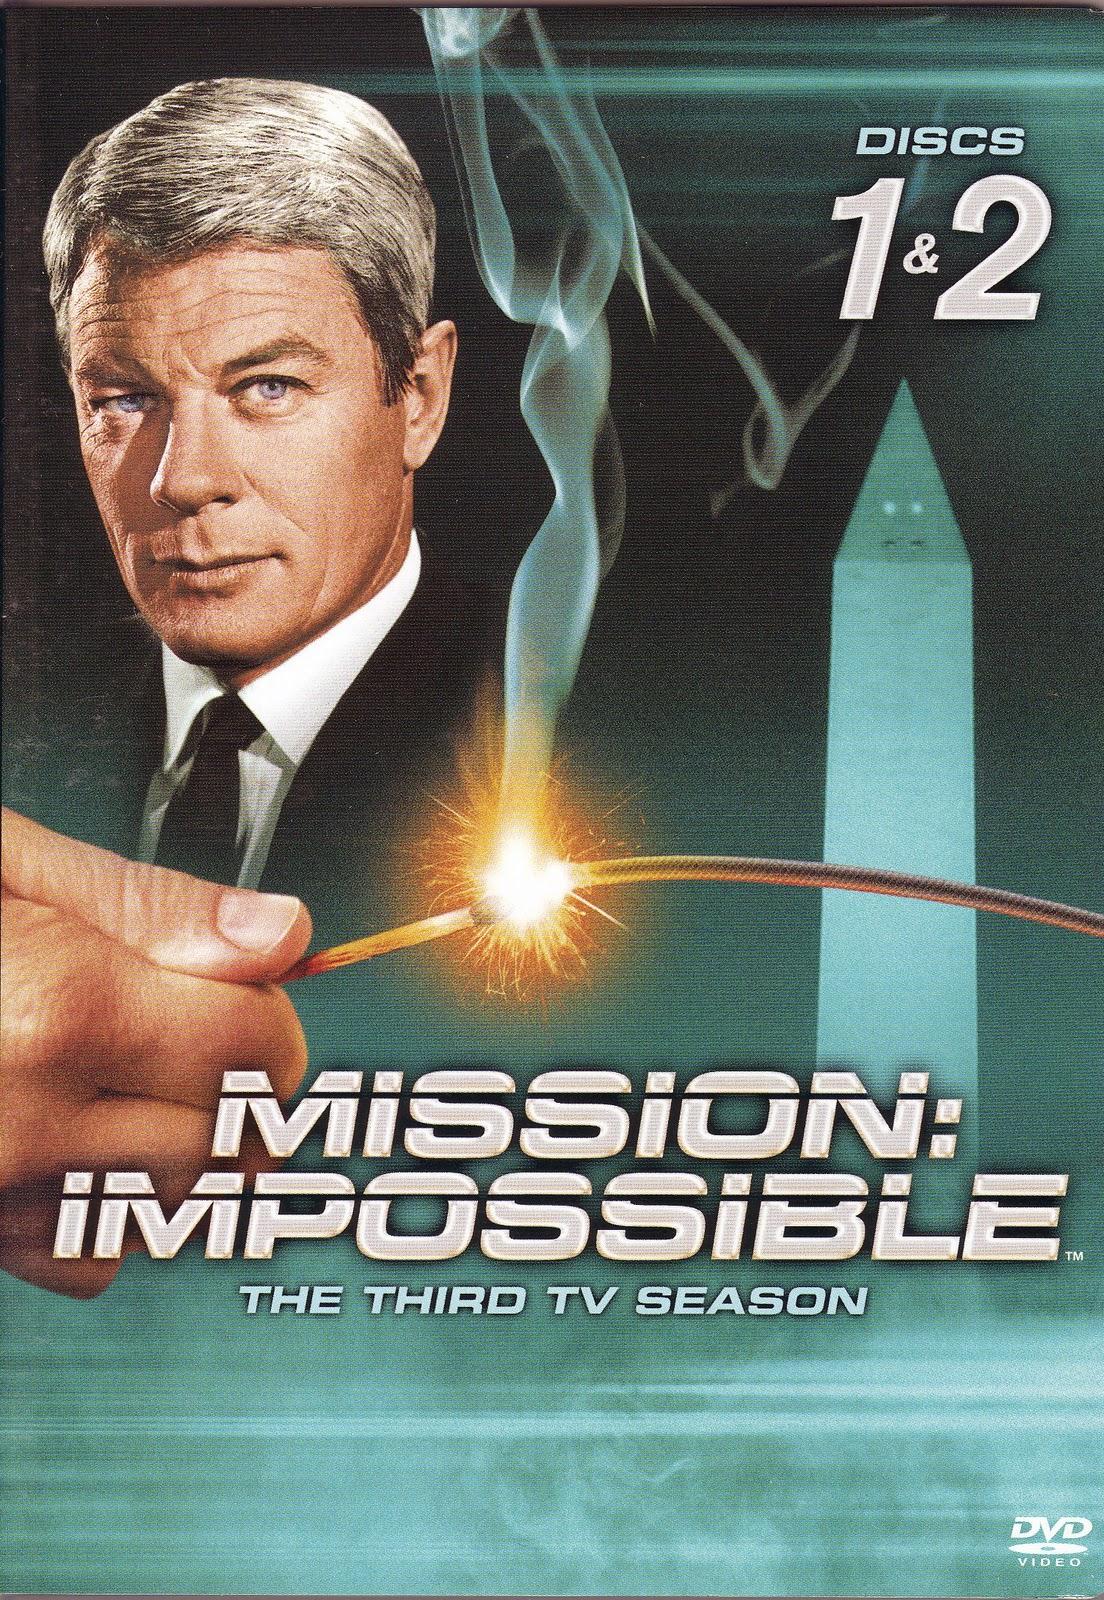 foto de mission impossible 3 subtitles free » risingpowersglobalresponses.com